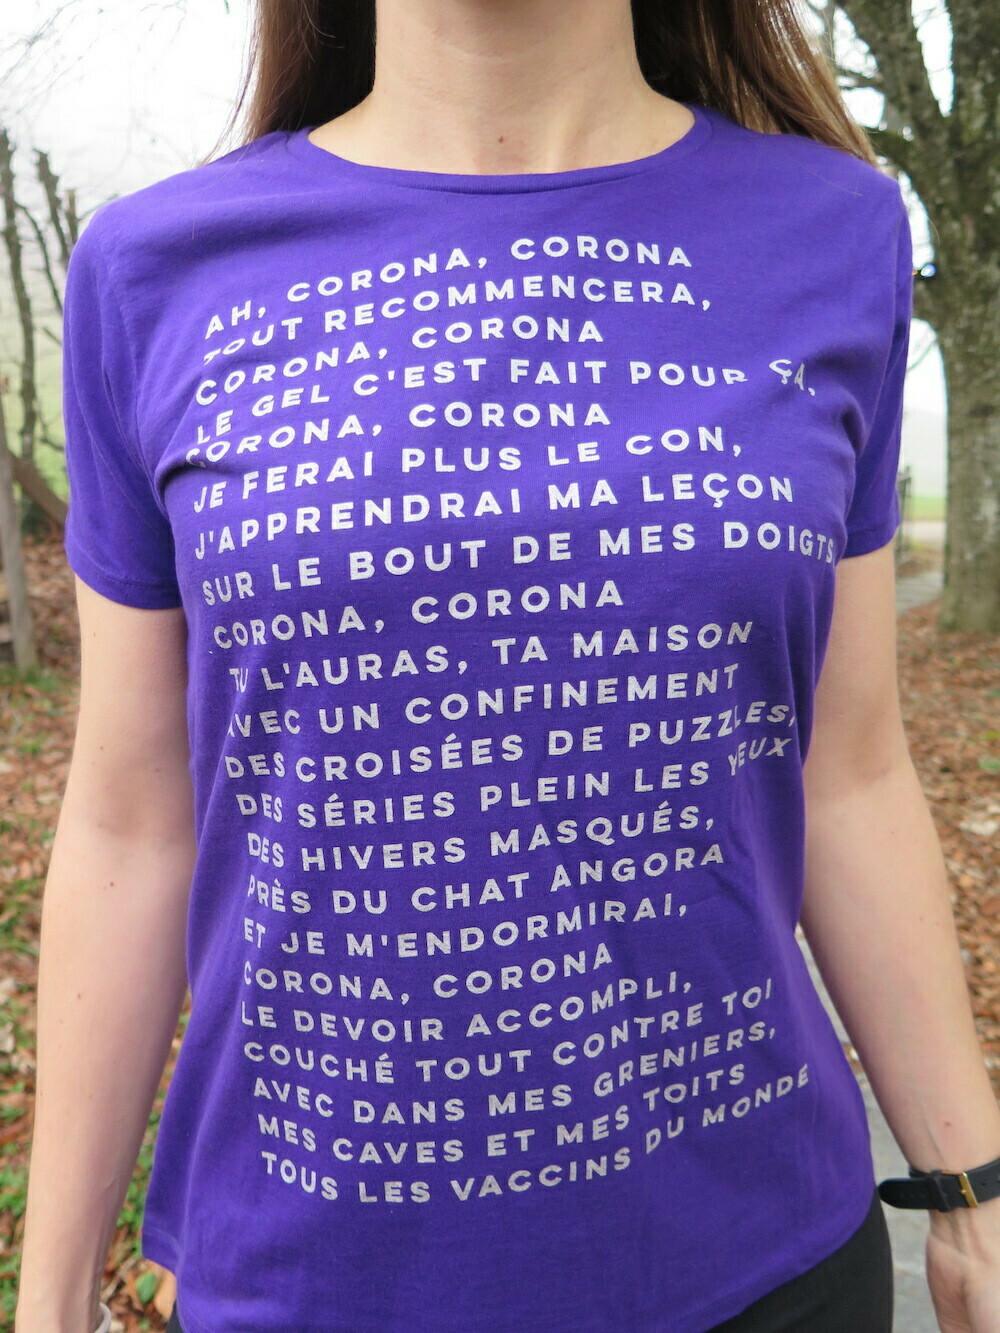 T-Shirt Particules Femme - Ah corona, corona, tout recommencera, corona, corona... 🎶